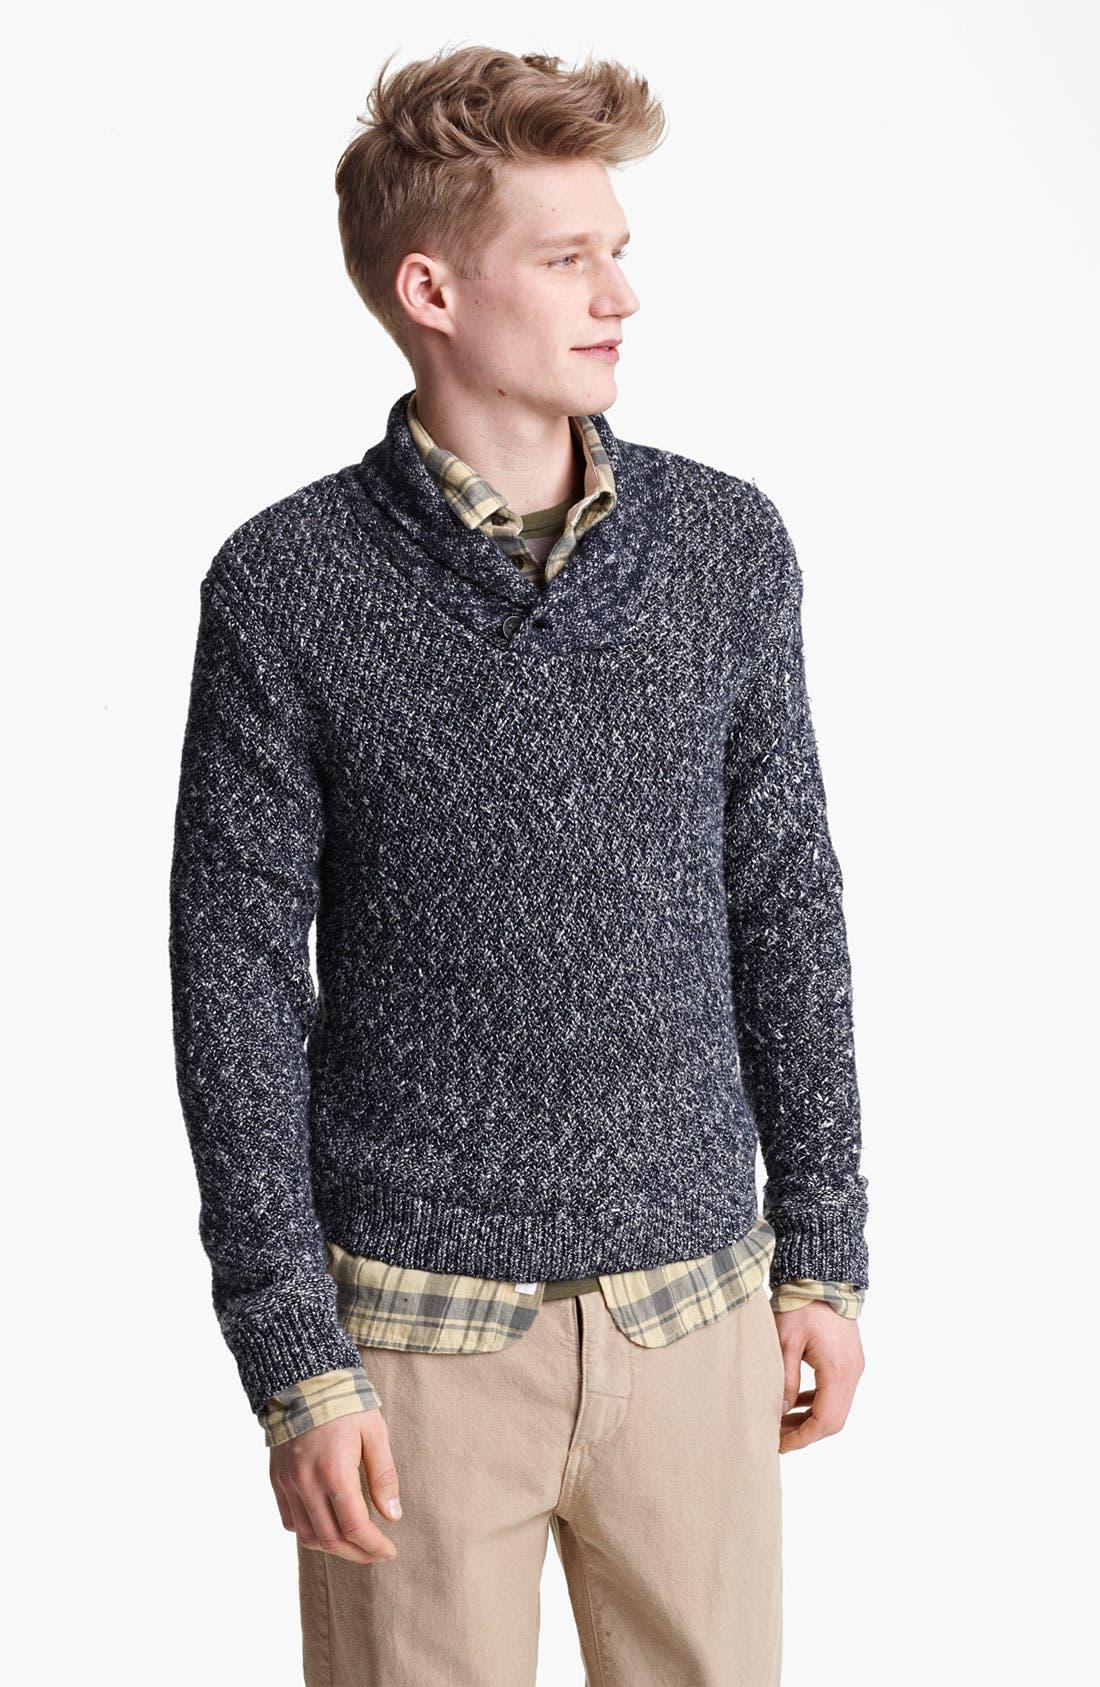 Alternate Image 1 Selected - rag & bone 'Alturas' Shawl Collar Sweater